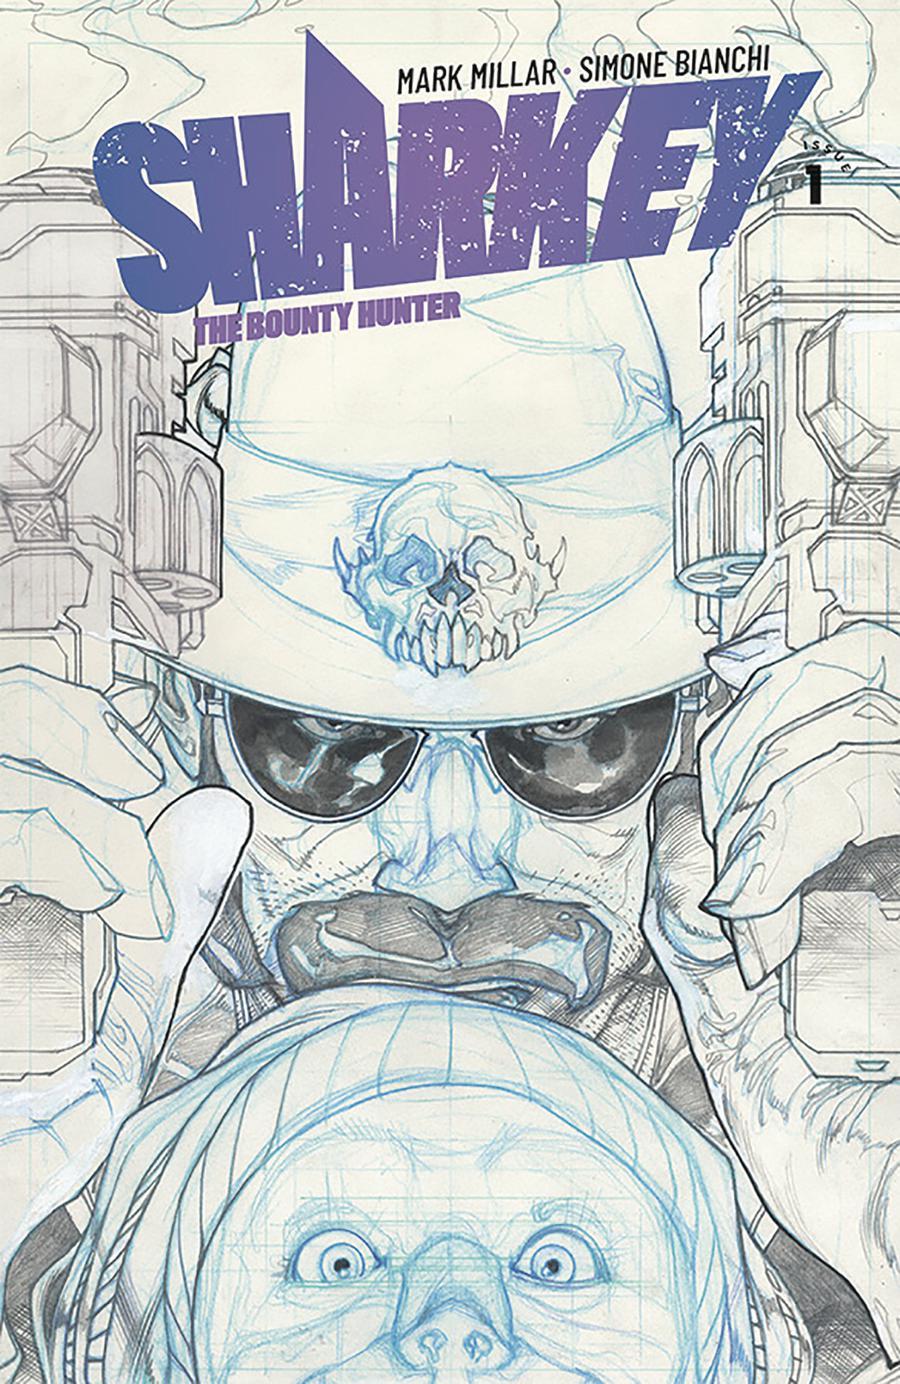 Sharkey The Bounty Hunter #1 Cover B Variant Simone Biachi Sketch Cover